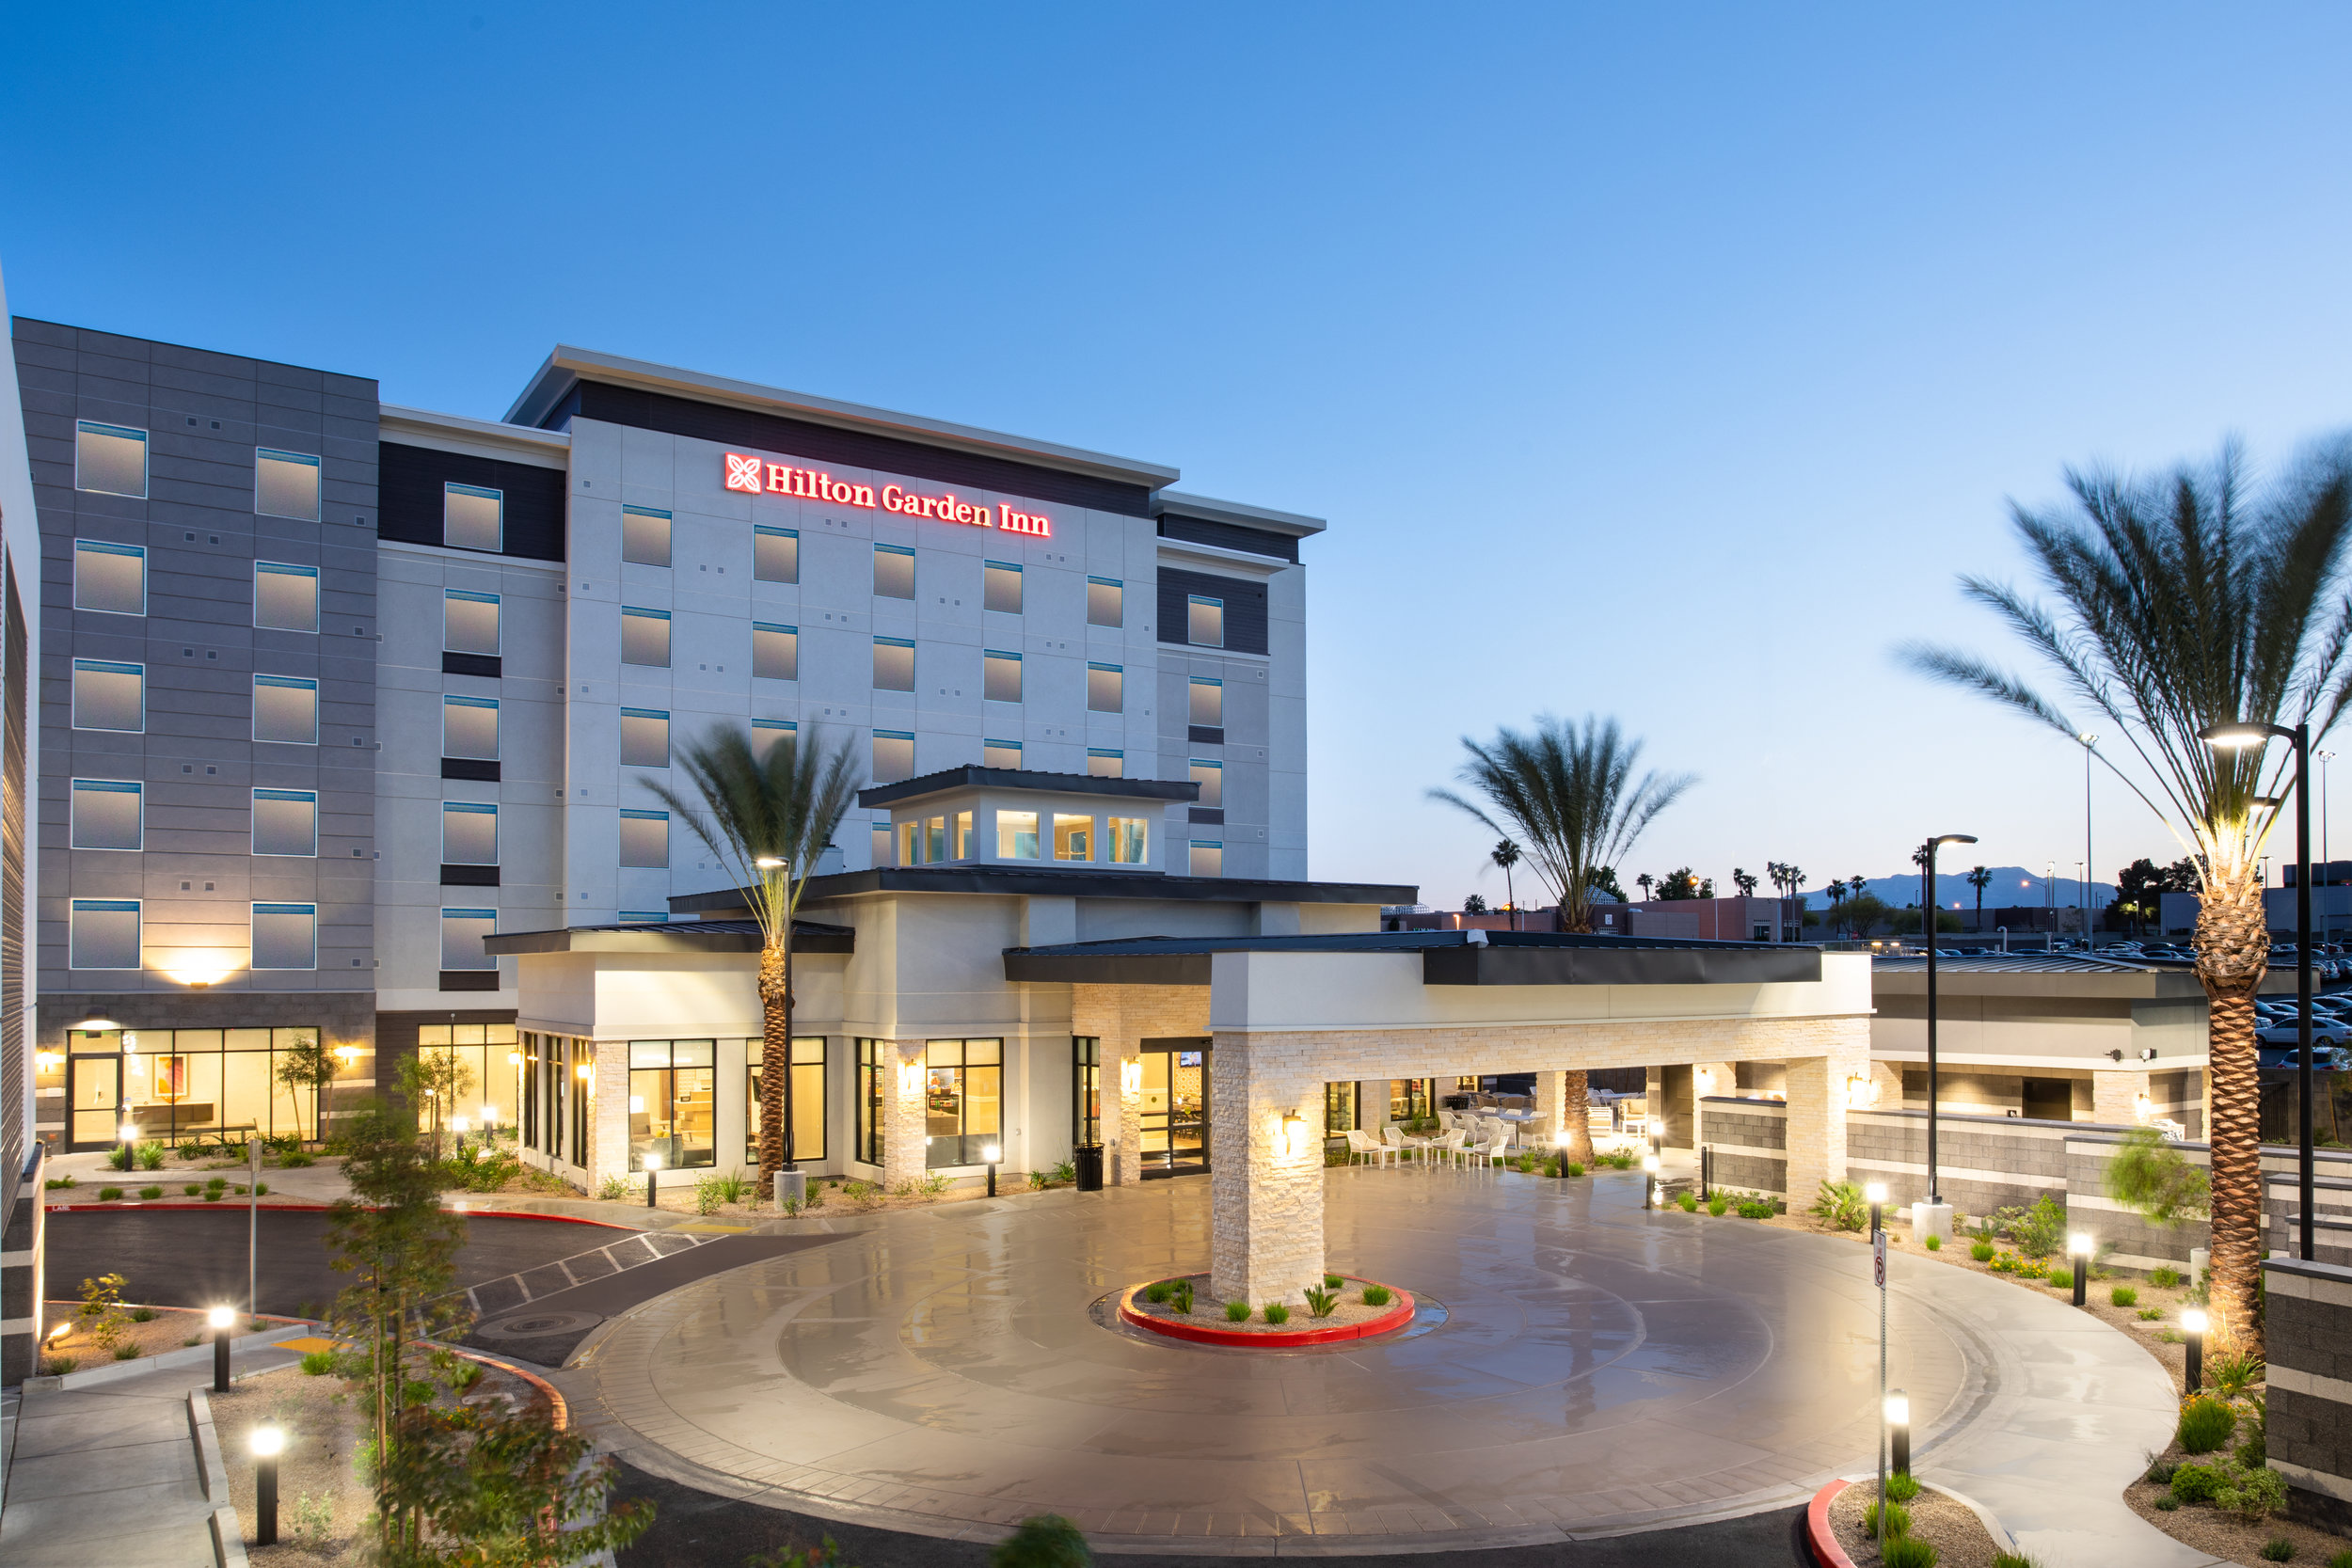 LASLGGI Hilton Garden Inn Las Vegas Exterior Dusk.jpg